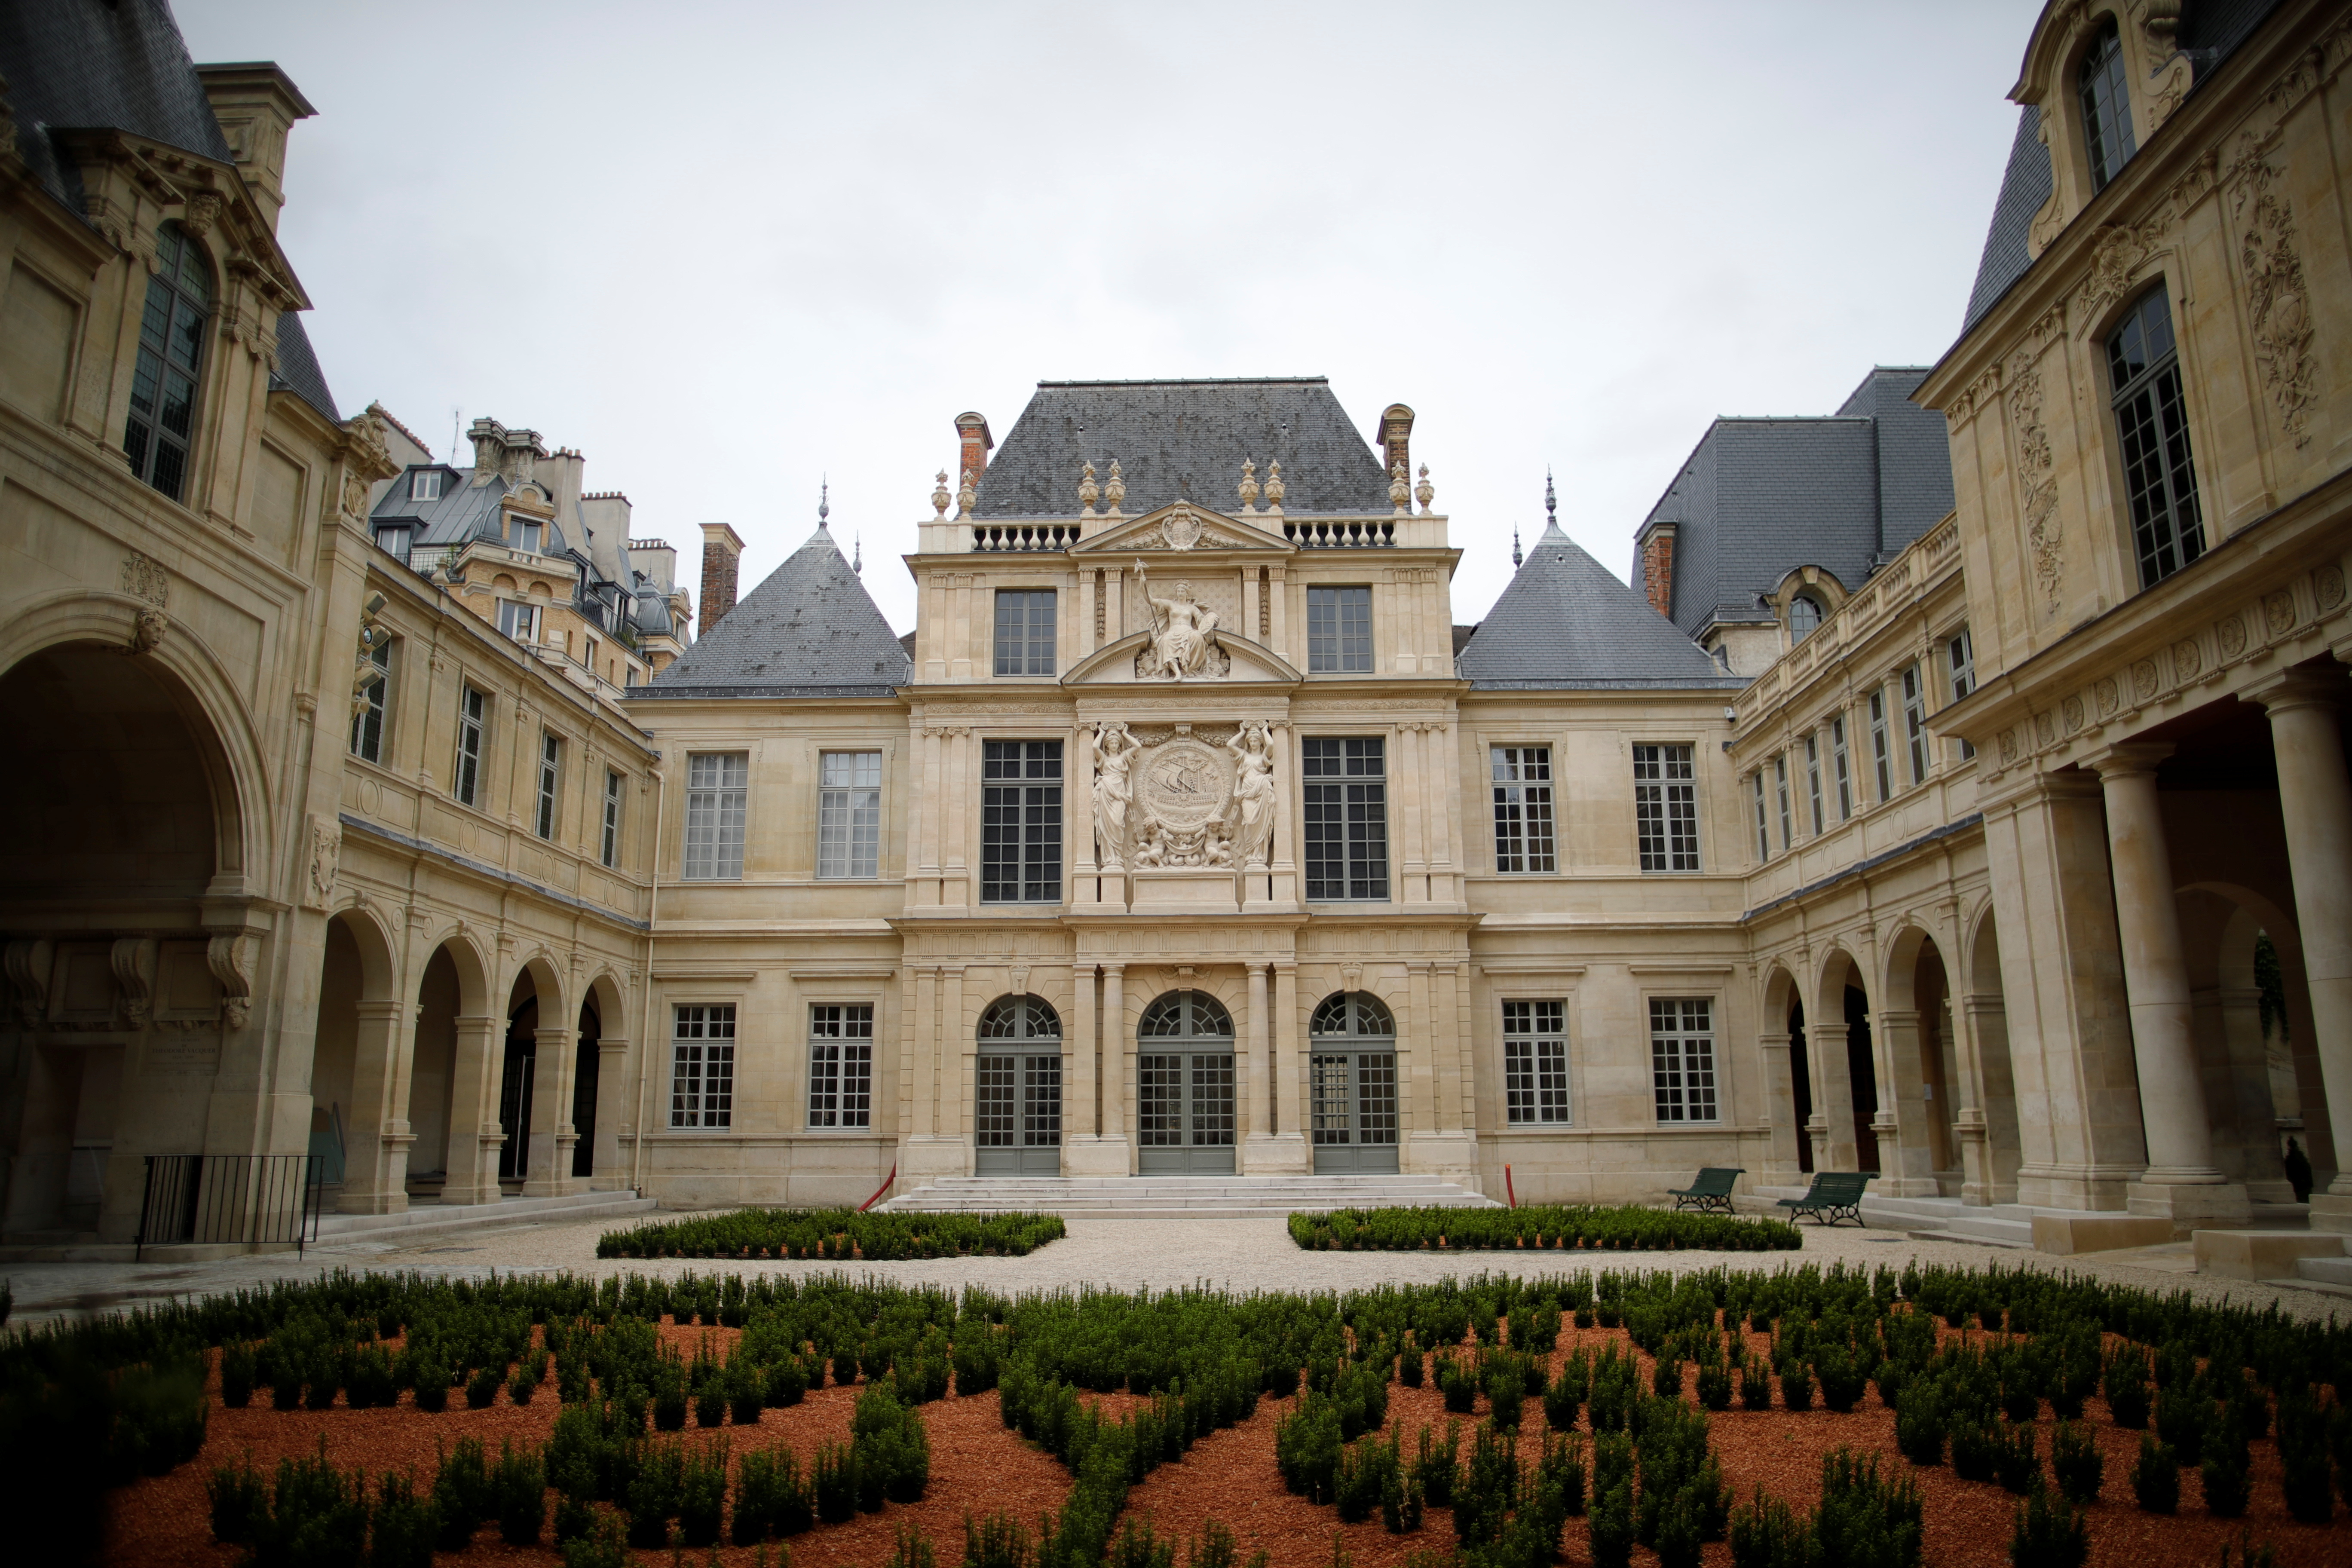 Revolutionaries and royalty showcased at revamped Paris museum